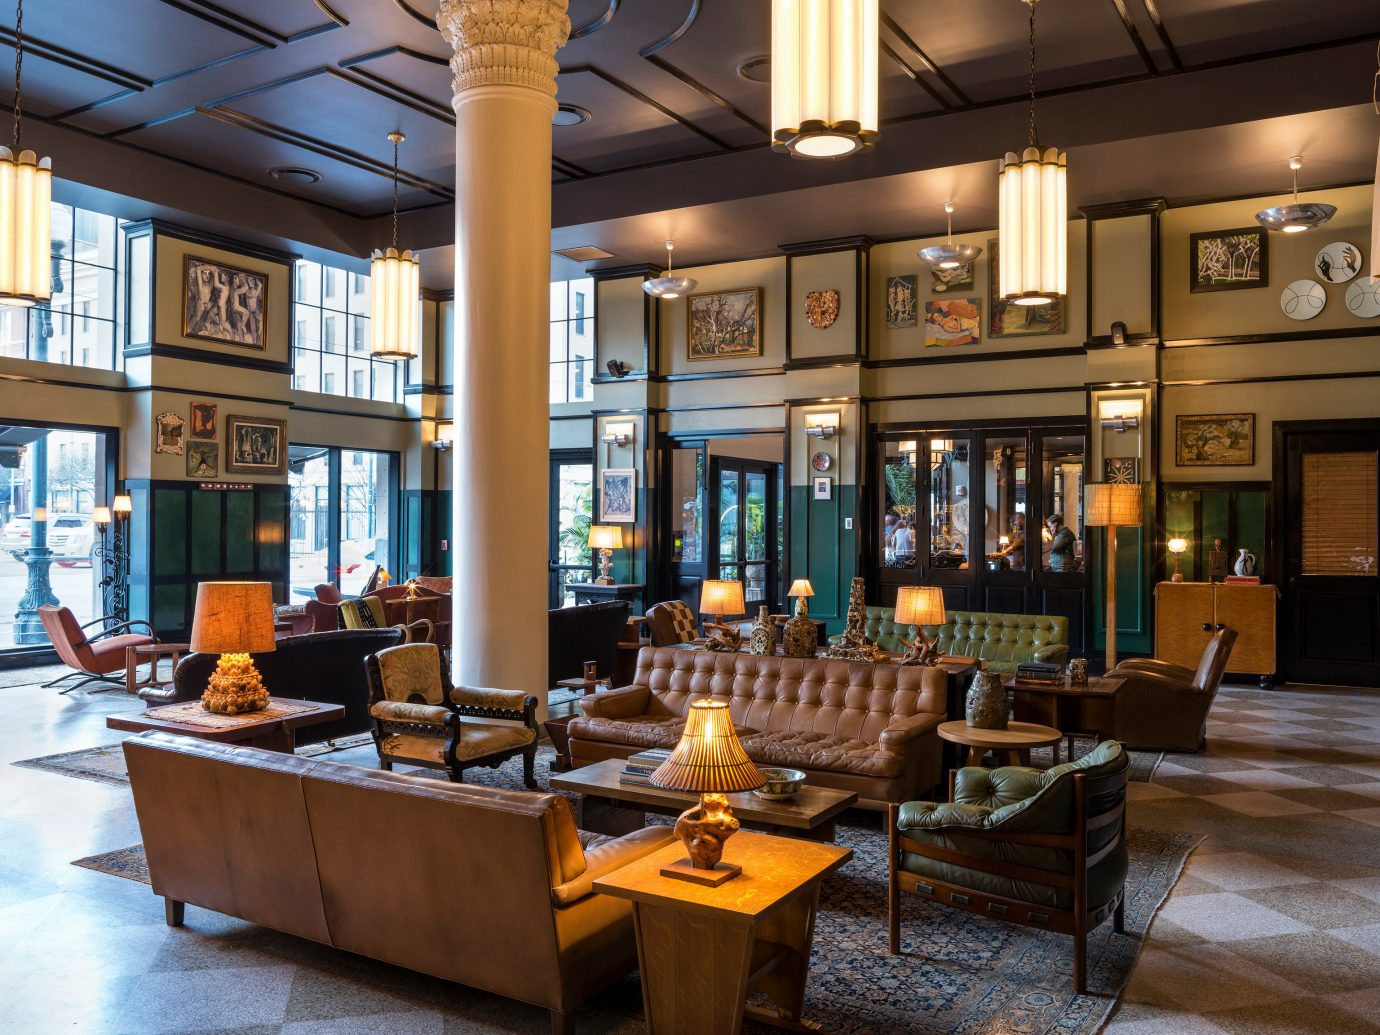 Hotels indoor Lobby room estate Bar restaurant interior design café furniture